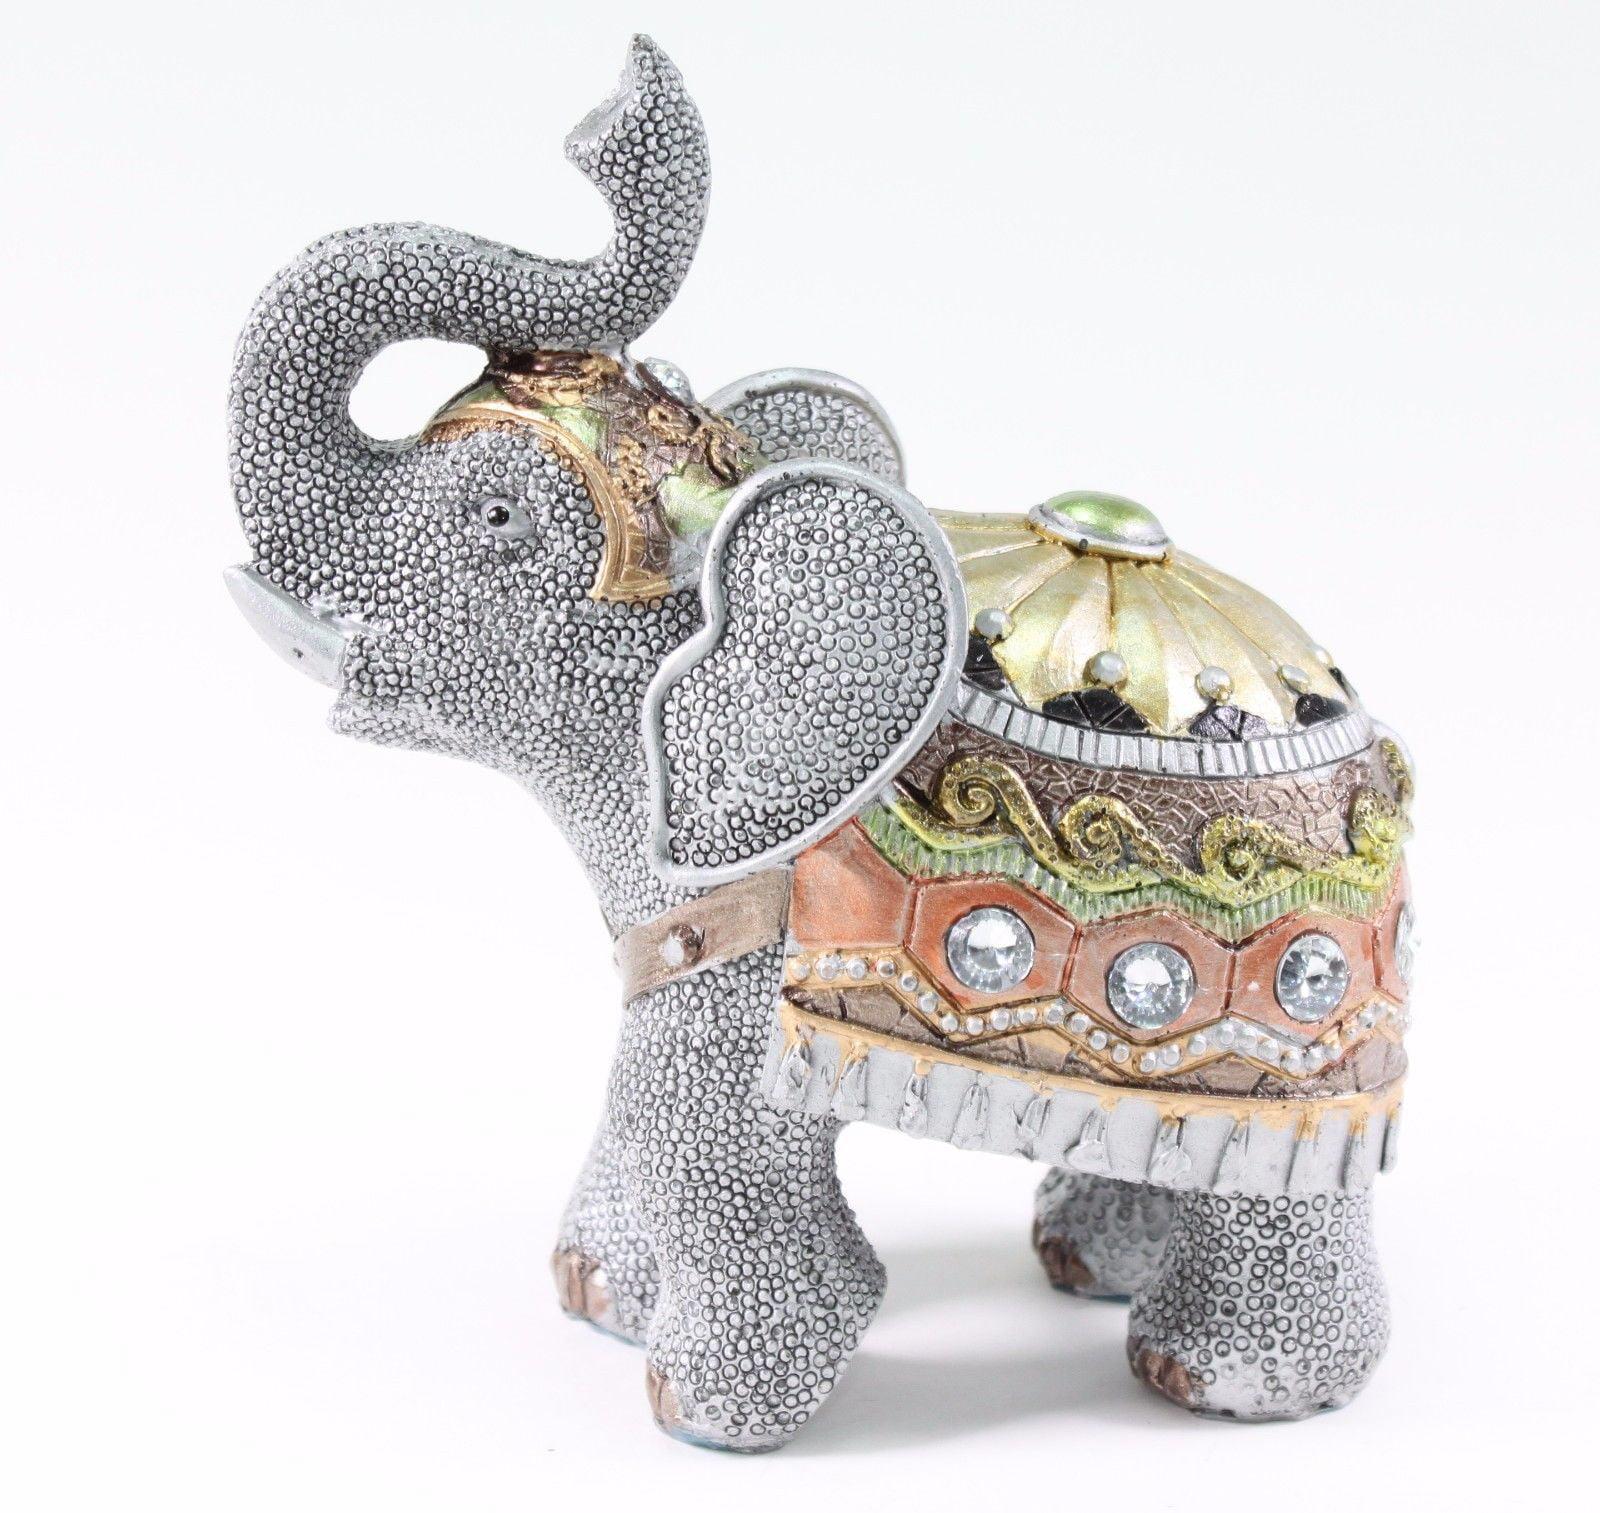 "Feng Shui 6.5"" Gray Elephant Trunk Statue Lucky Figurine Gift Home Decor"